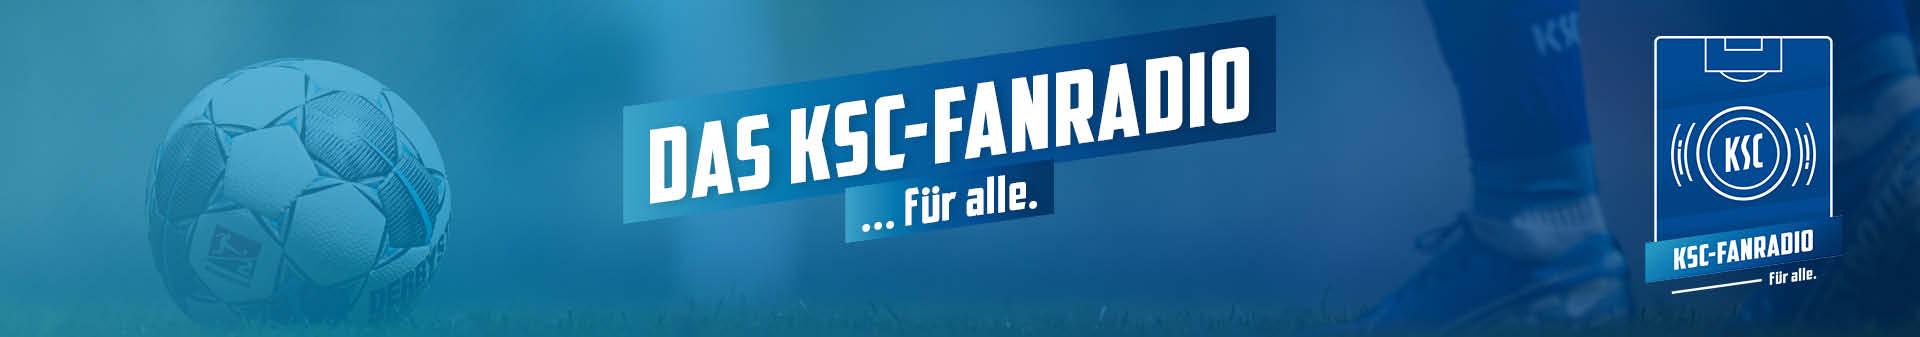 Ksc Fanradio